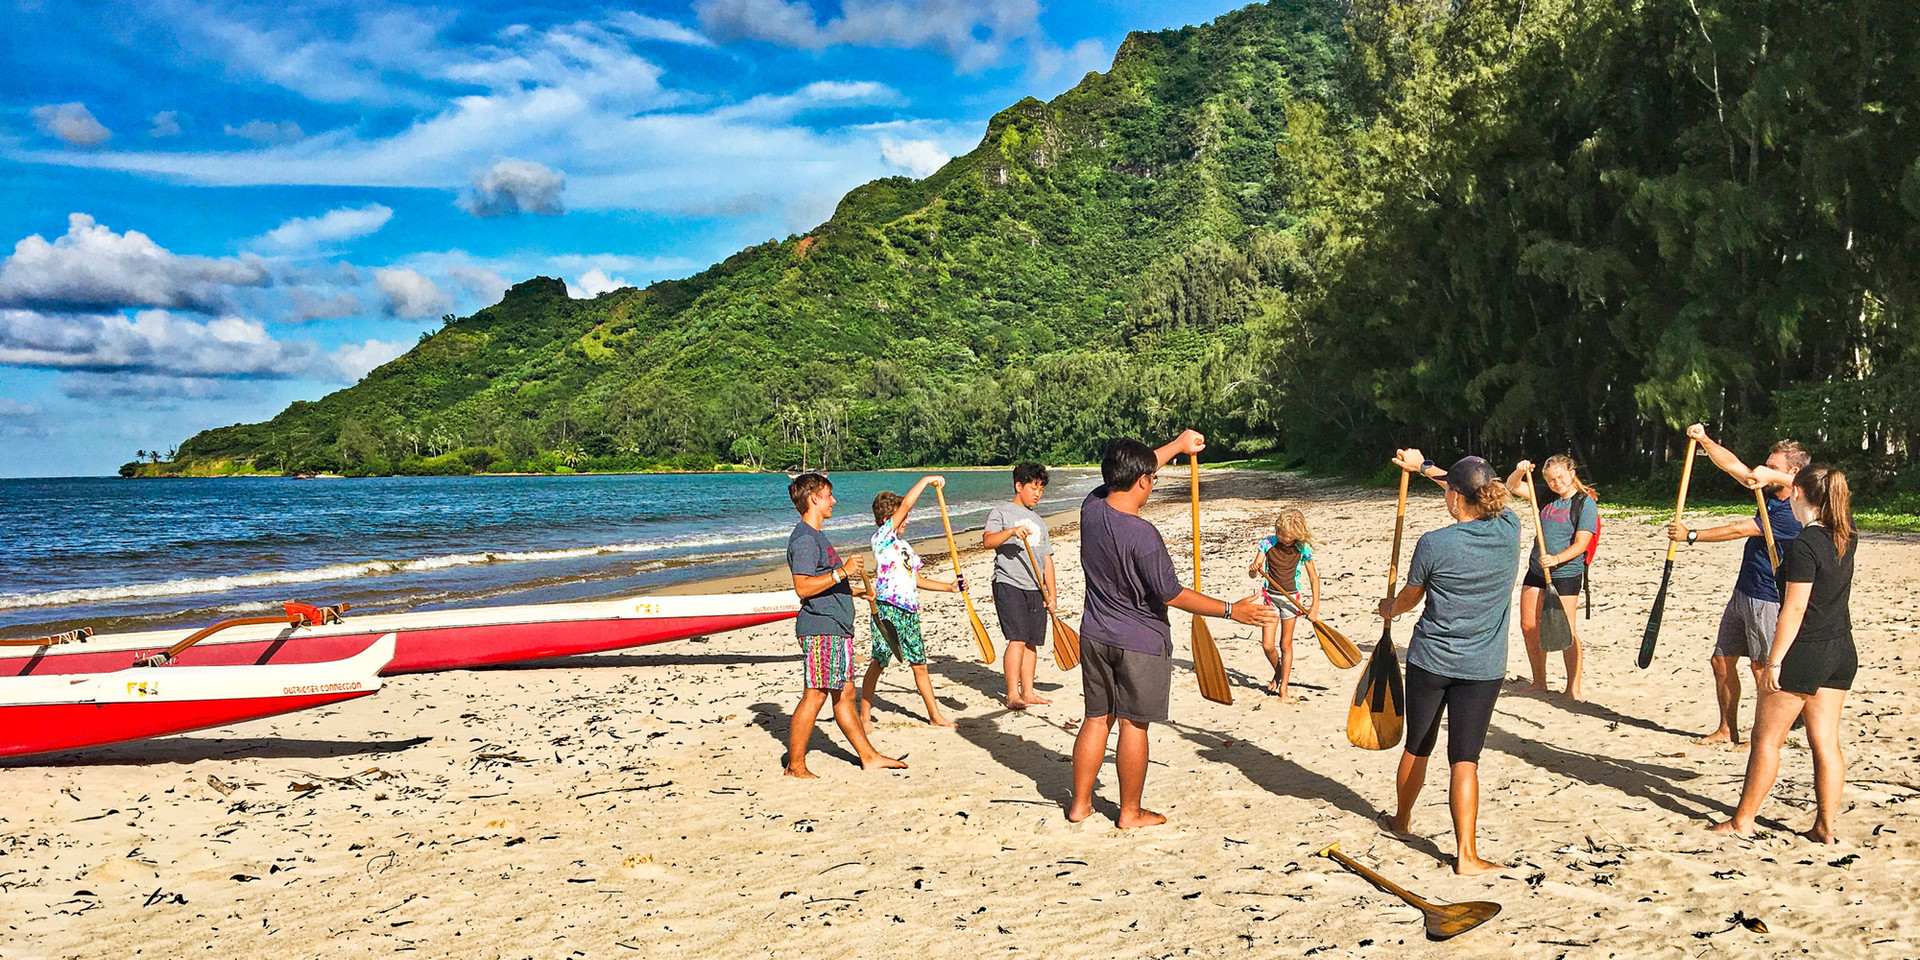 Canoe paddling lessons